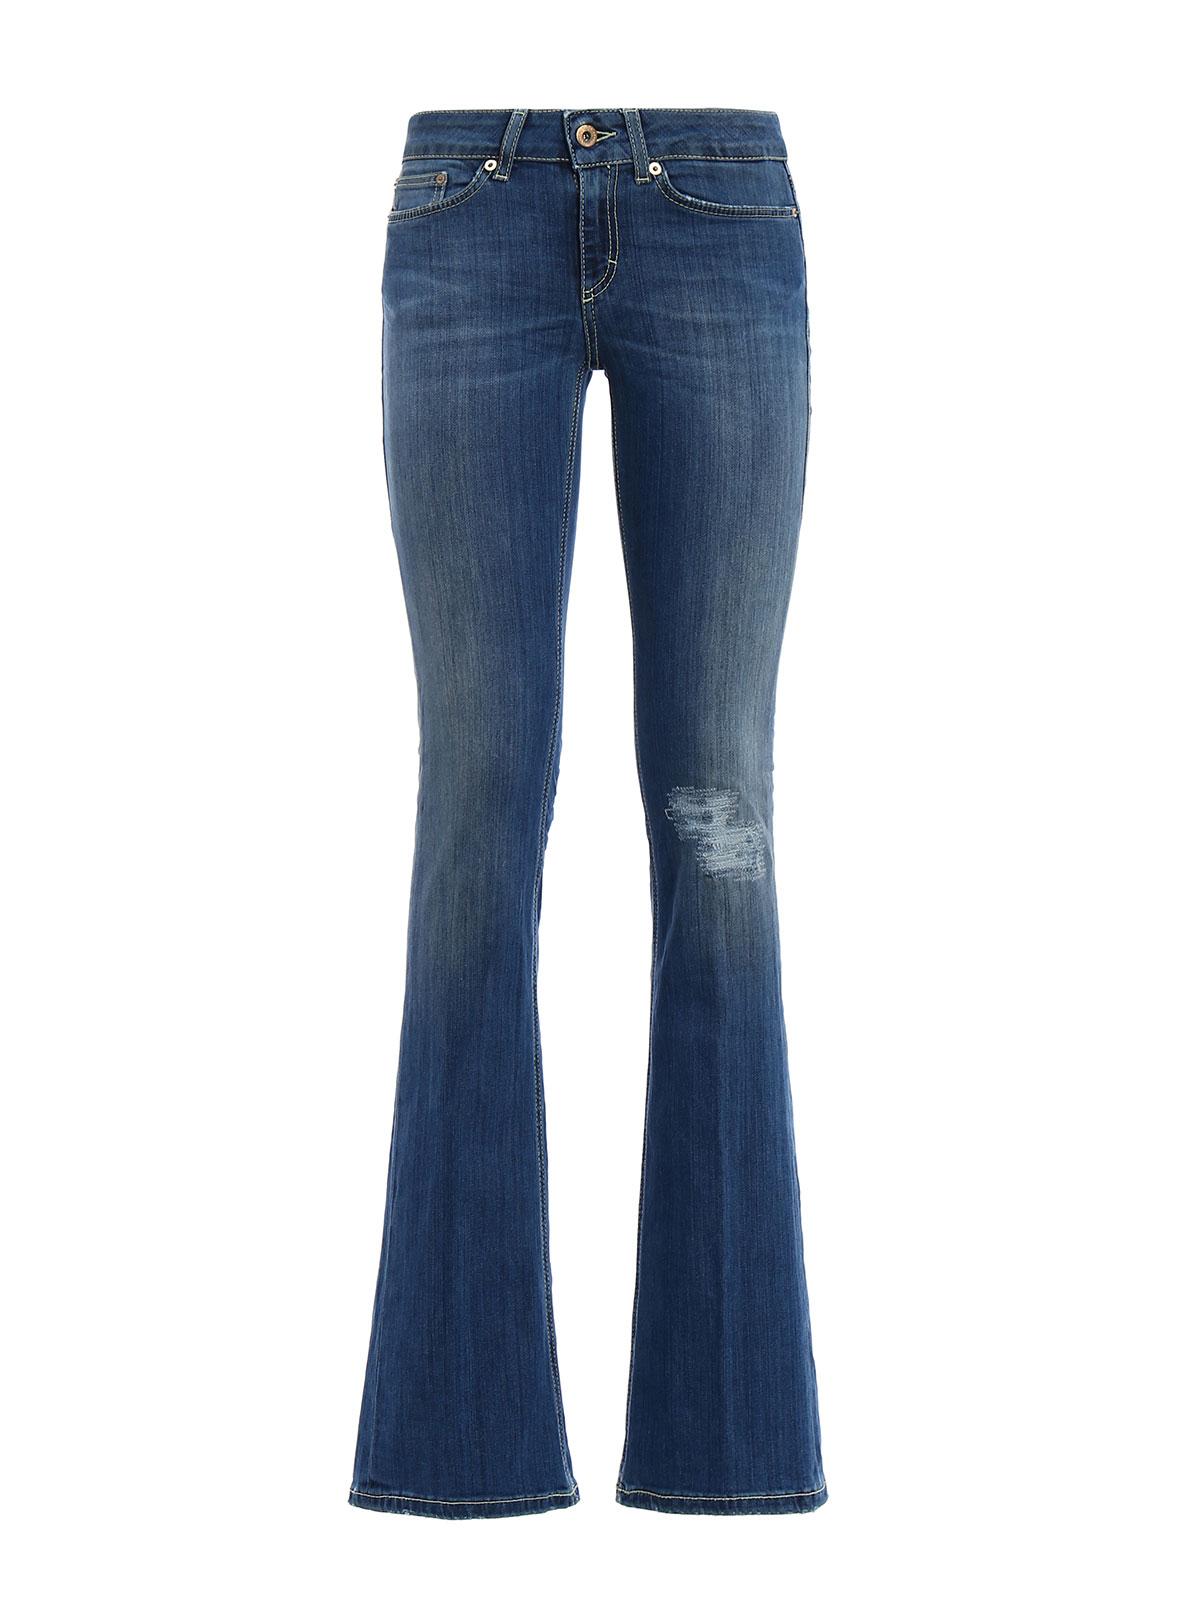 unite low waist skinny jeans by dondup bootcut jeans shop online at. Black Bedroom Furniture Sets. Home Design Ideas